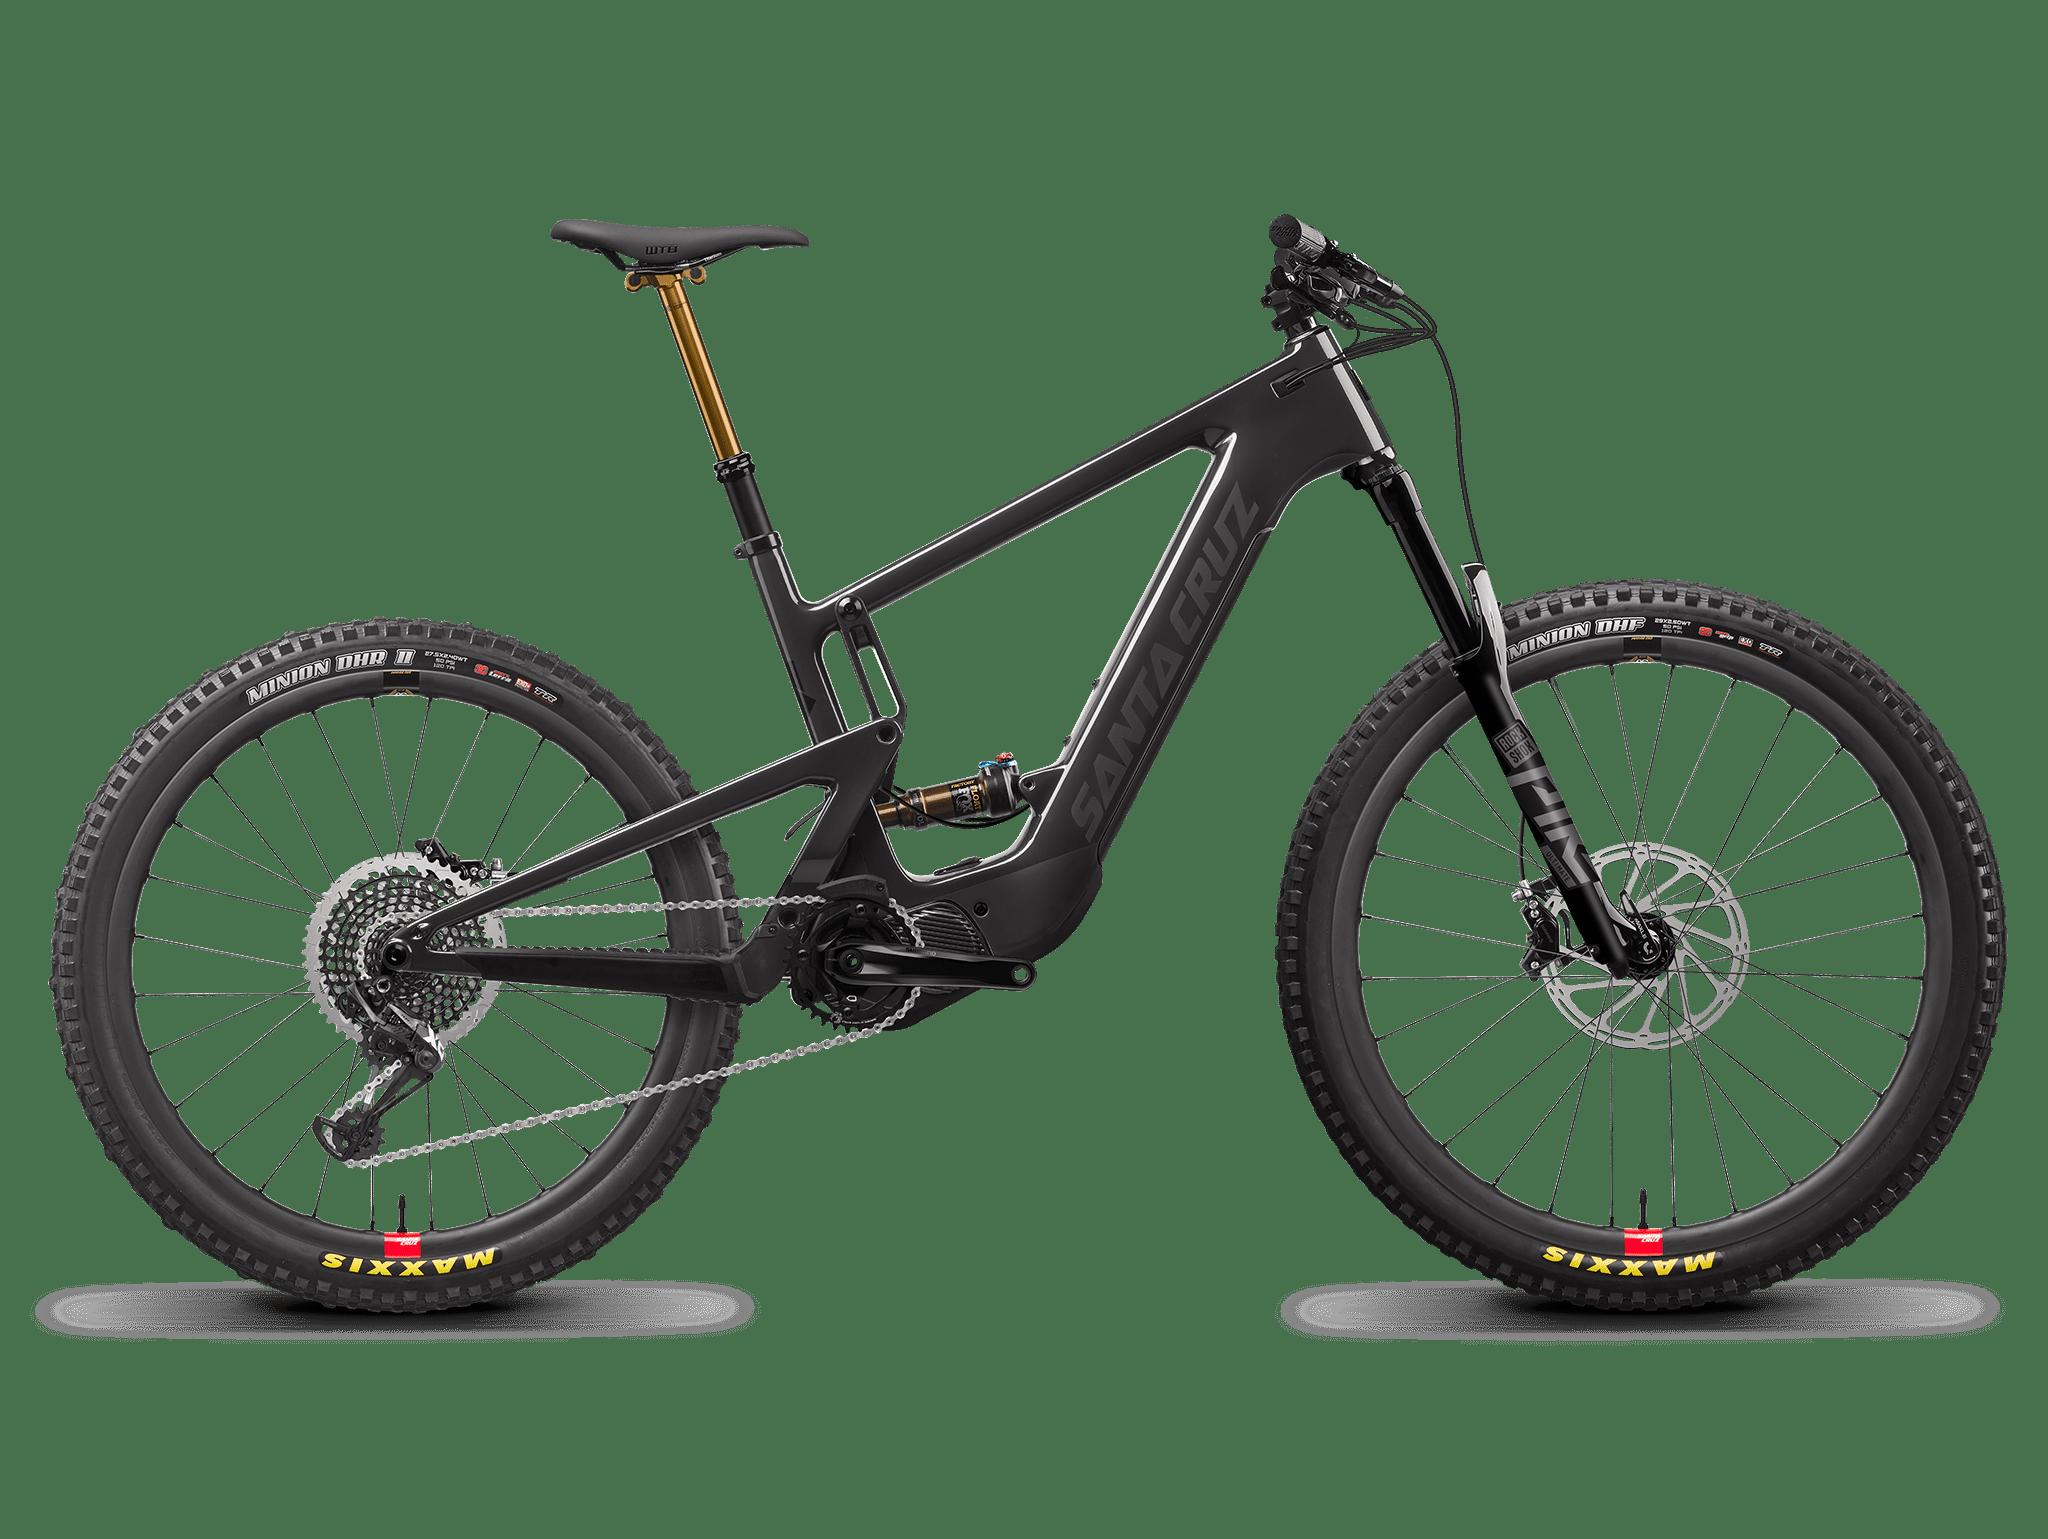 Image of Santa Cruz Heckler MX X01 Electric Mountain Bike 2022 Carbon